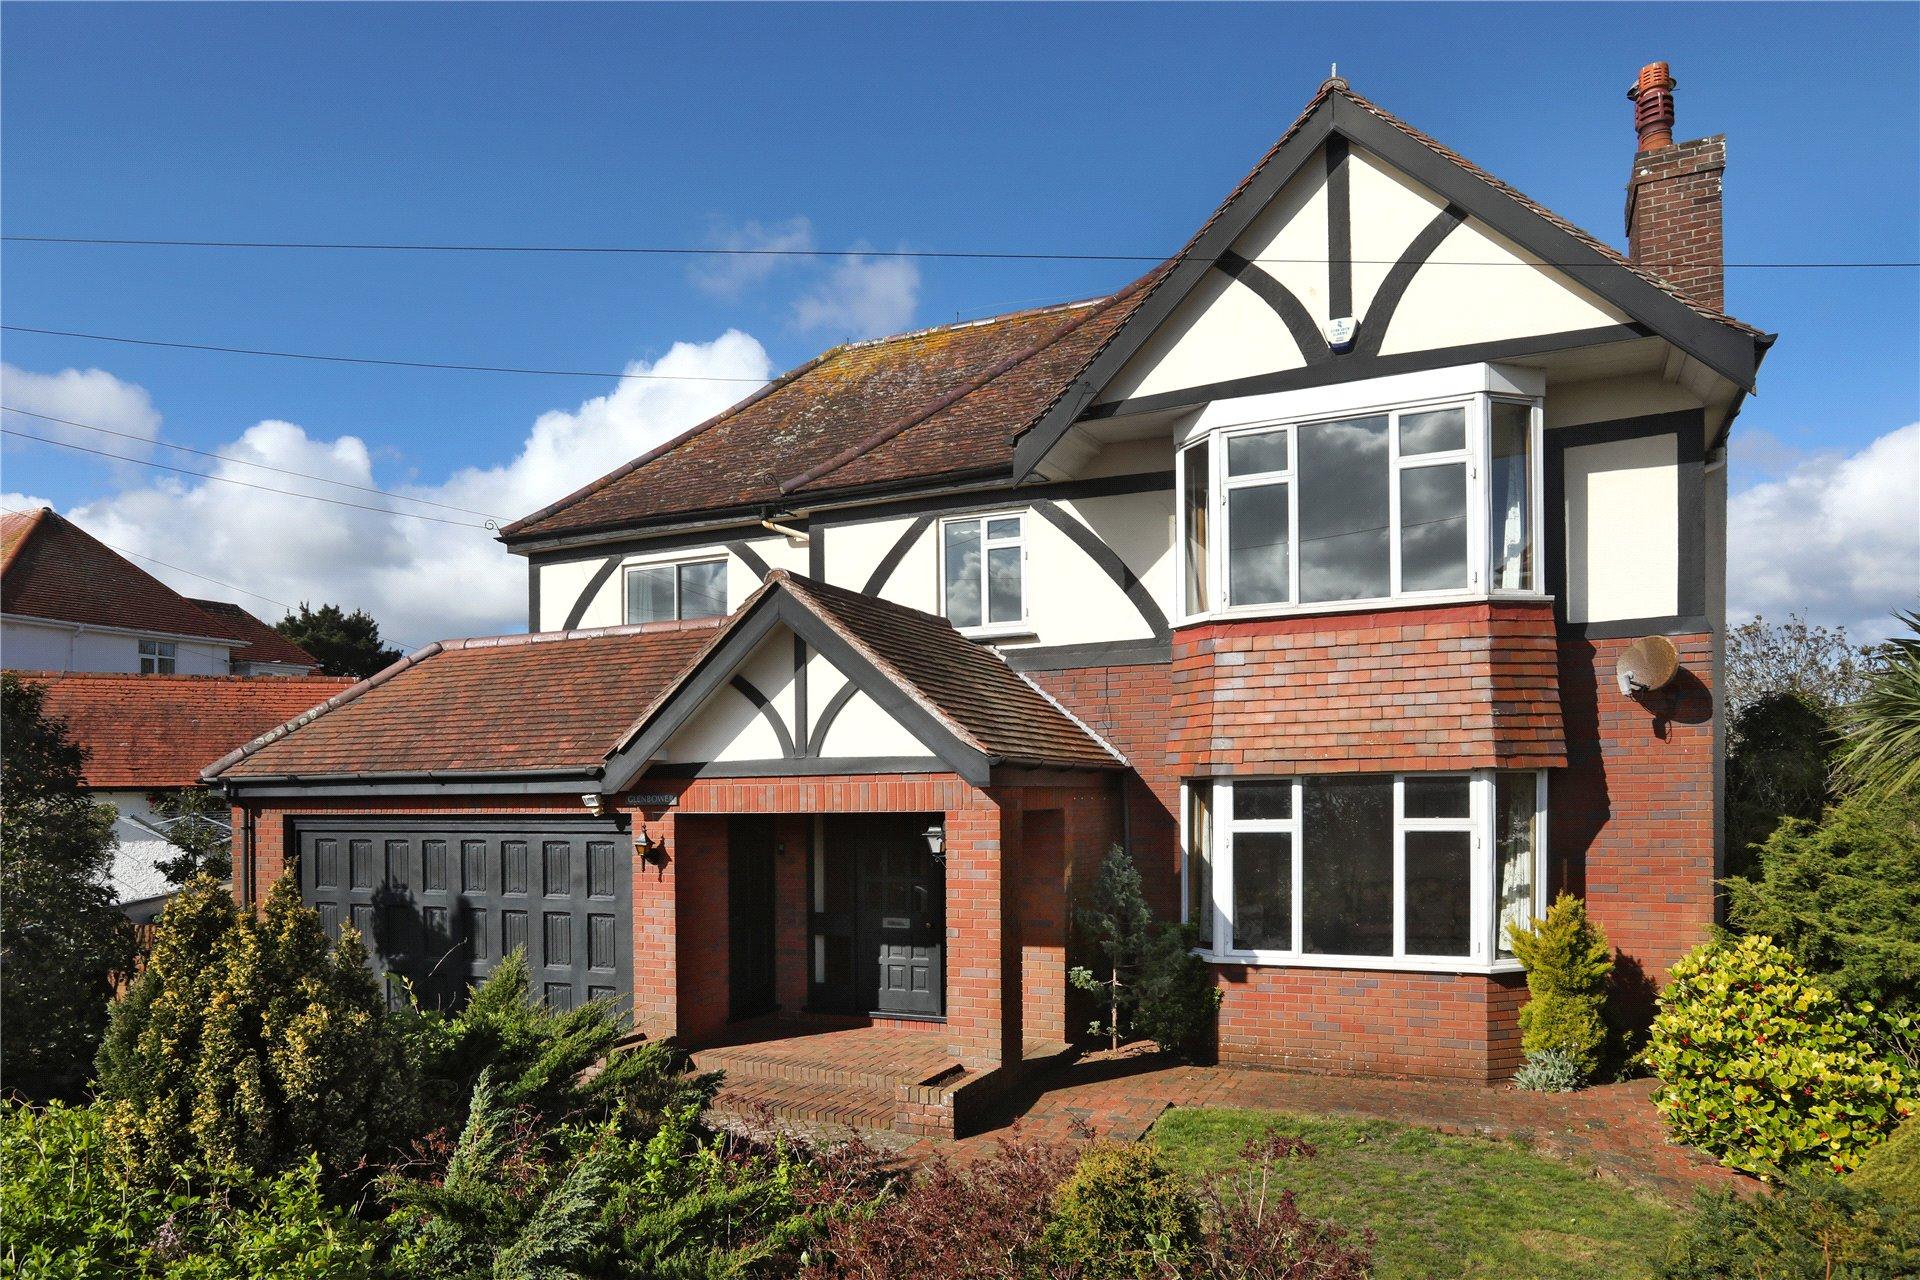 4 Bedroom Property For Sale In Roundham Avenue Paignton Devon